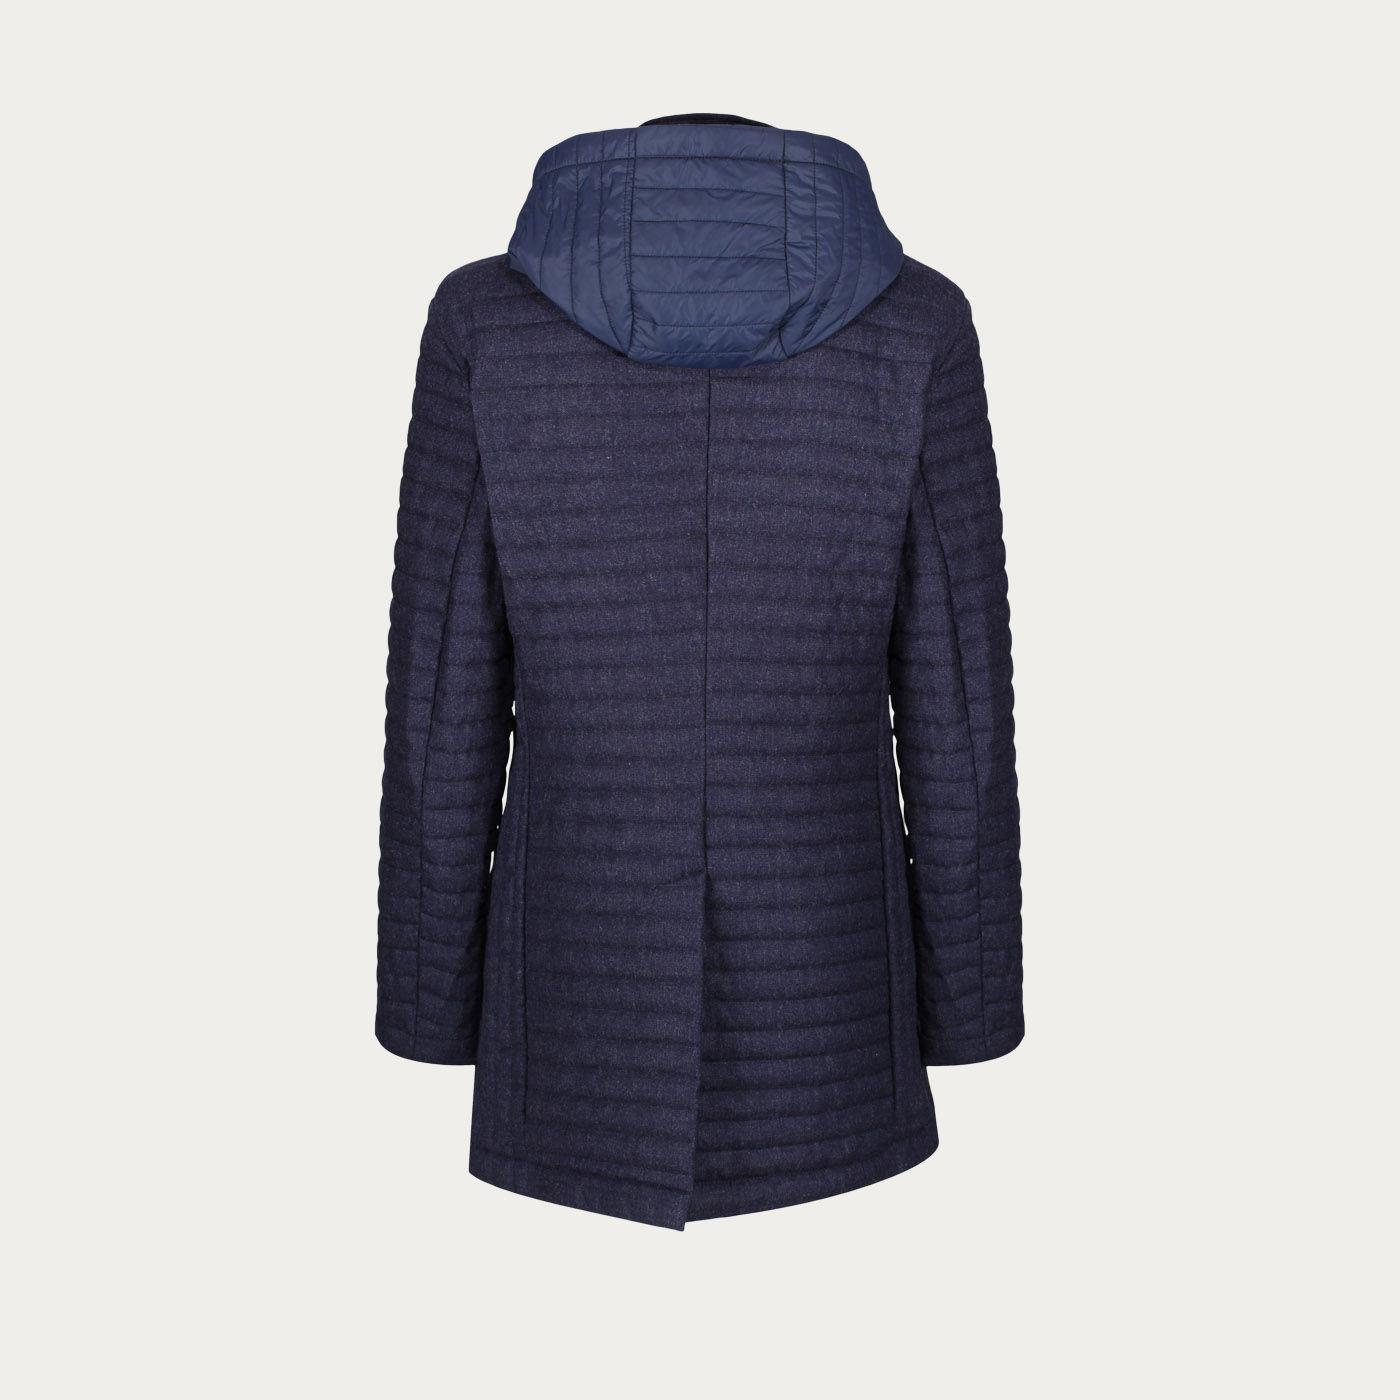 Navy Wool Q16 Quilt Jacket   Bombinate